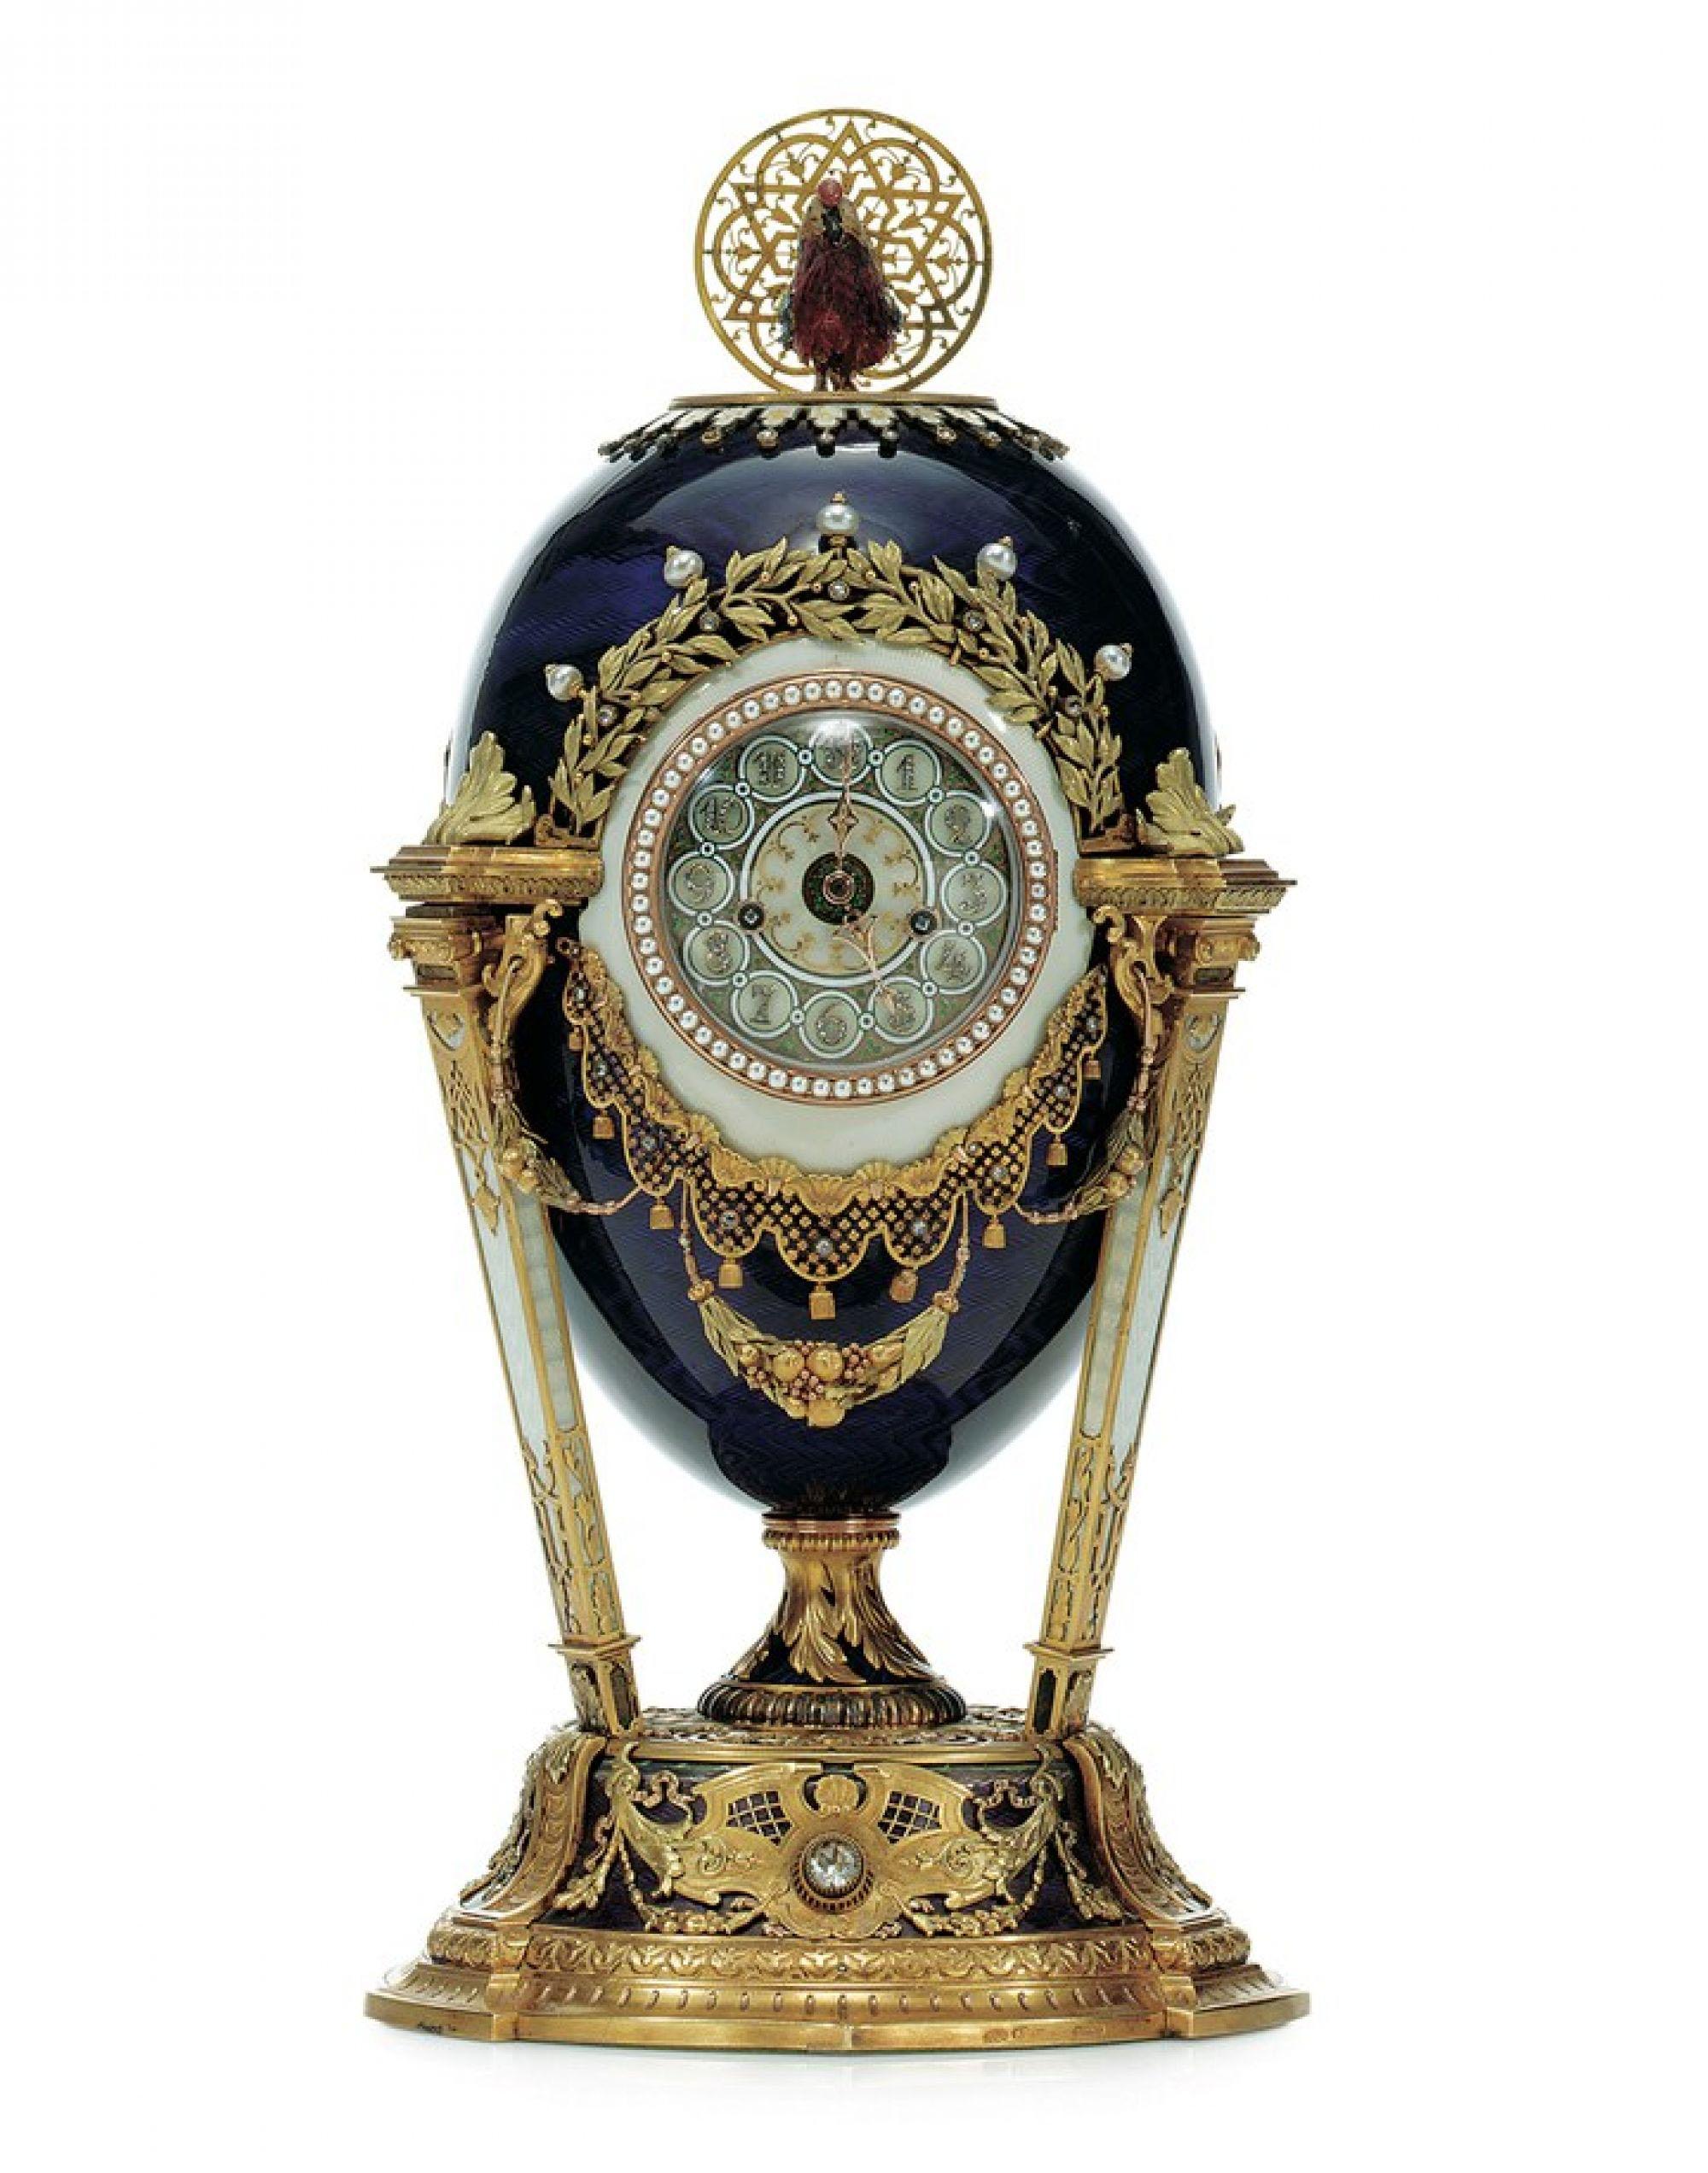 Easter Imperial Egg Fabergé